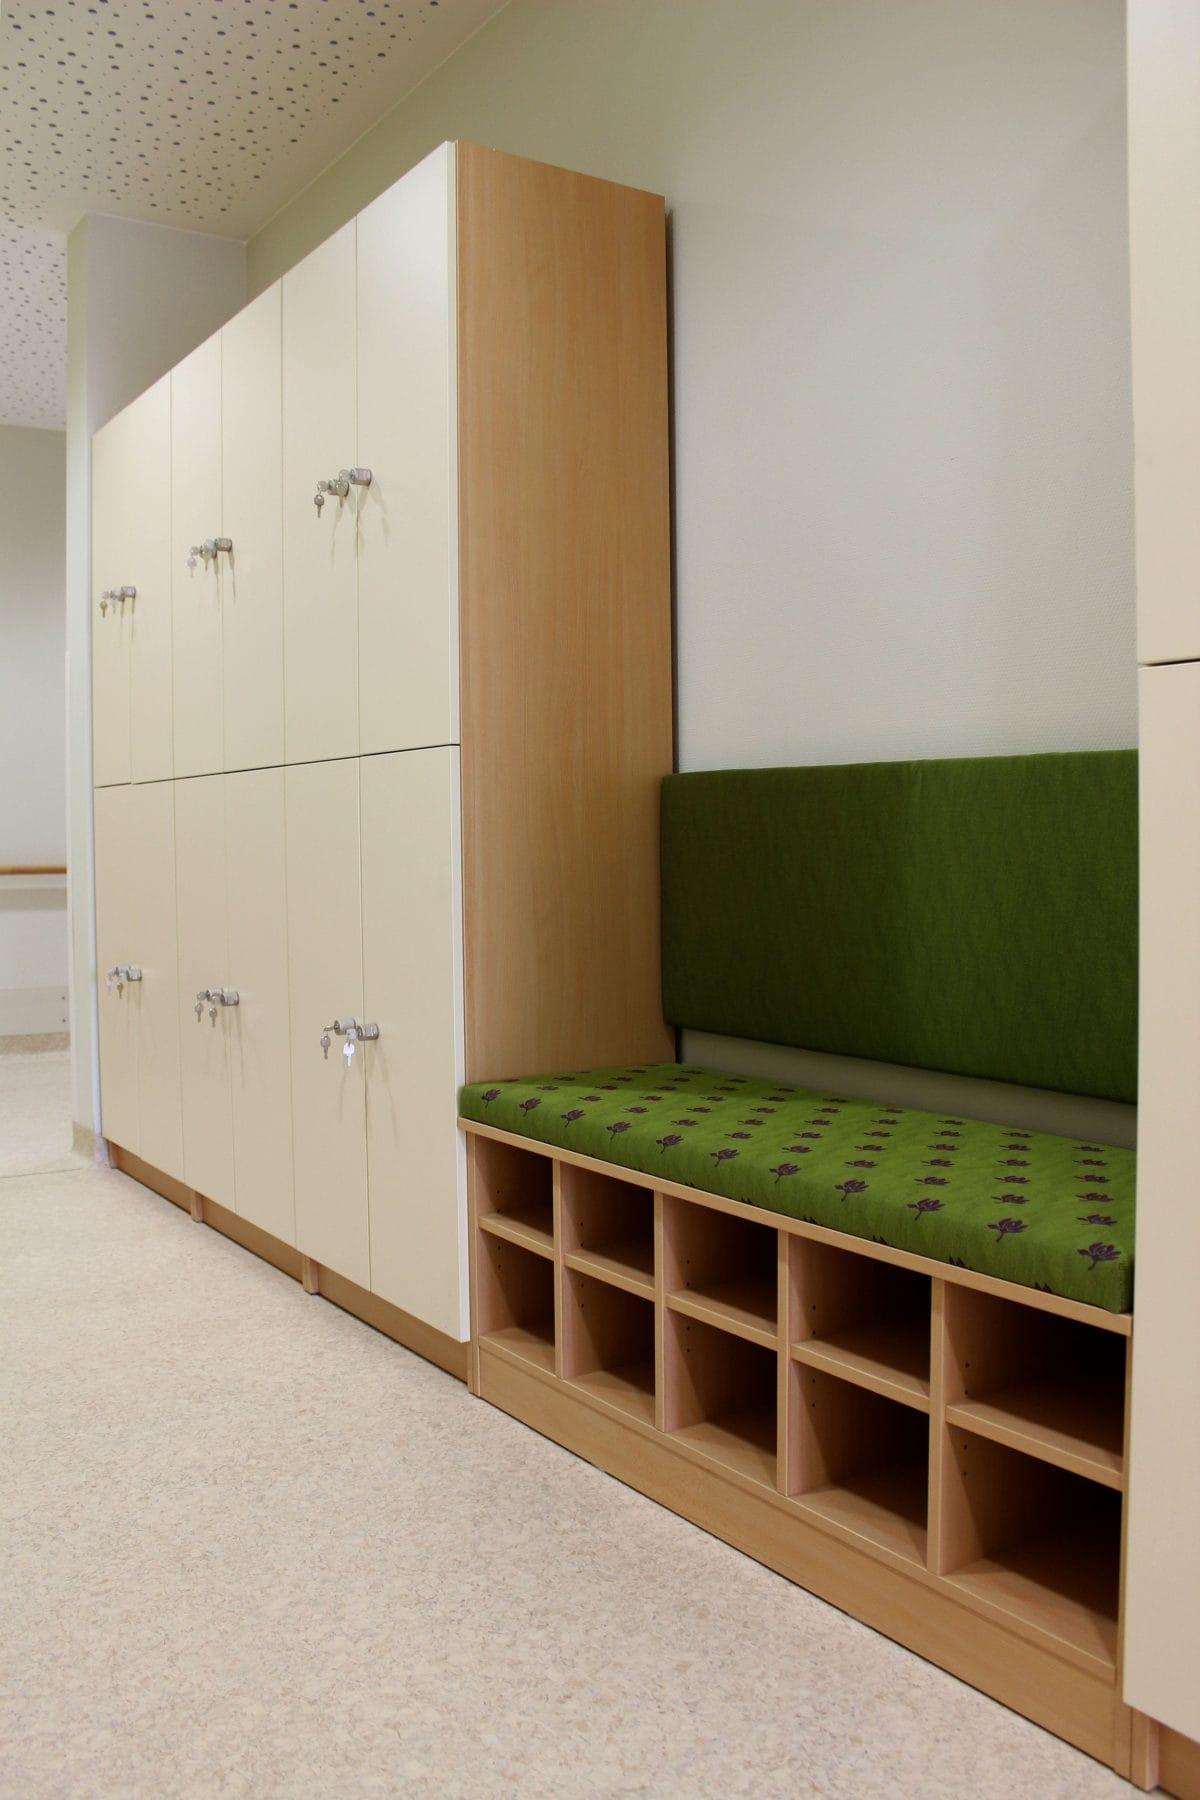 Neubau Tagespflege in modularer Bauweise, zertifiziertes Passivhaus | Wandelgang